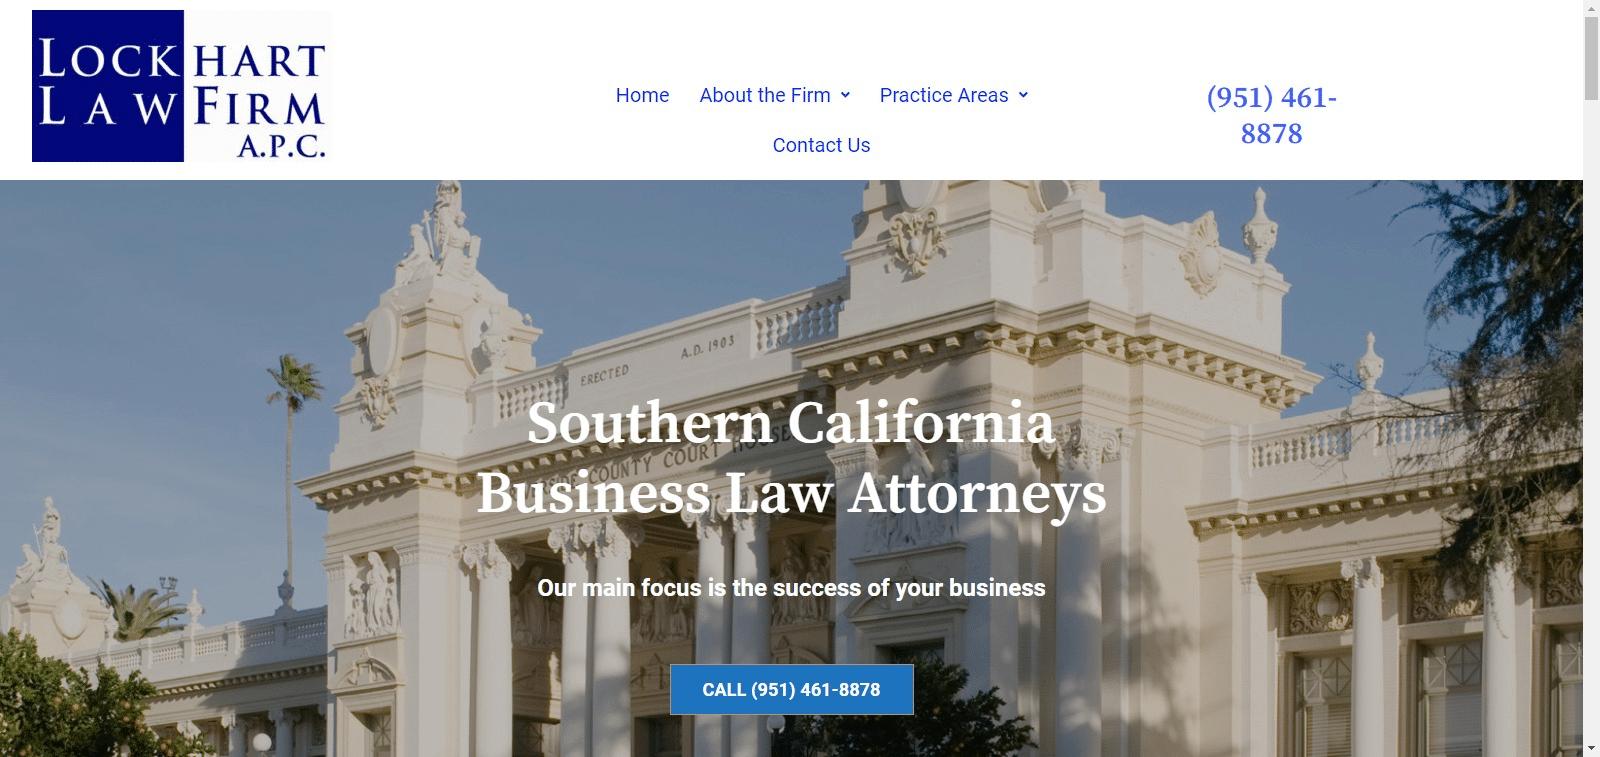 Lockhart Law Firm